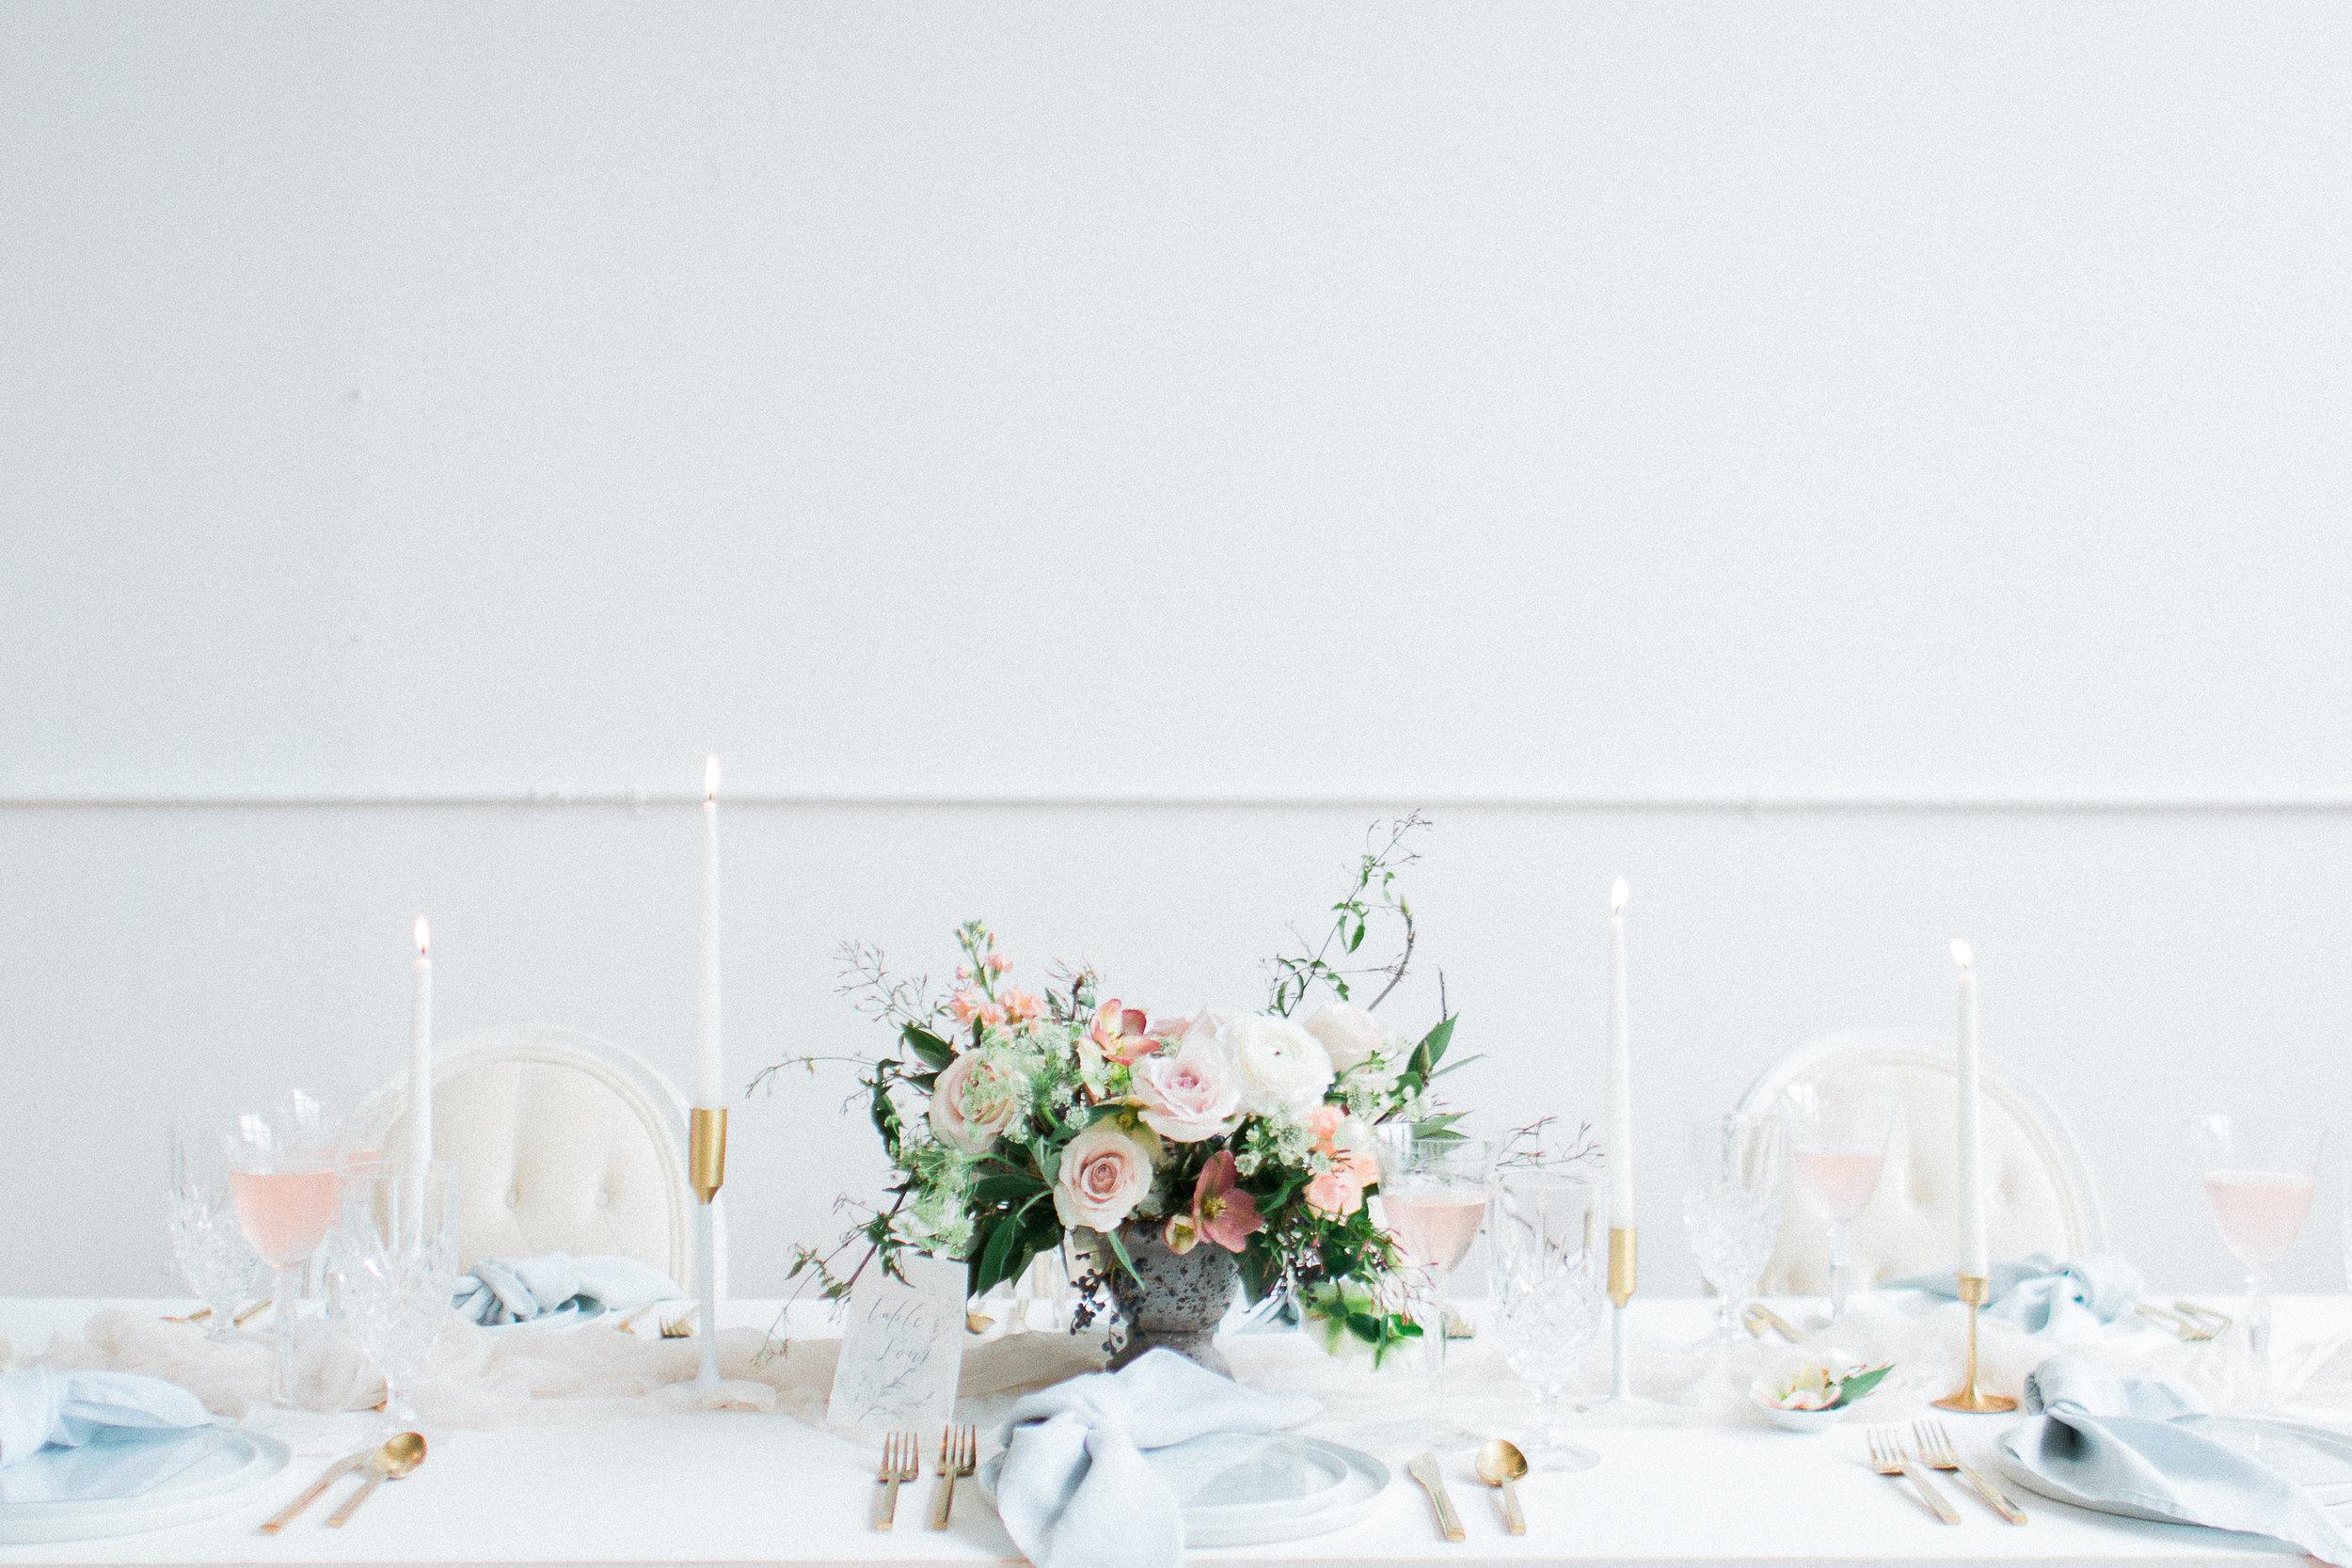 Bridalbliss.com | Portland Wedding | Oregon Event Planning and Design | Ashley Cook Photography